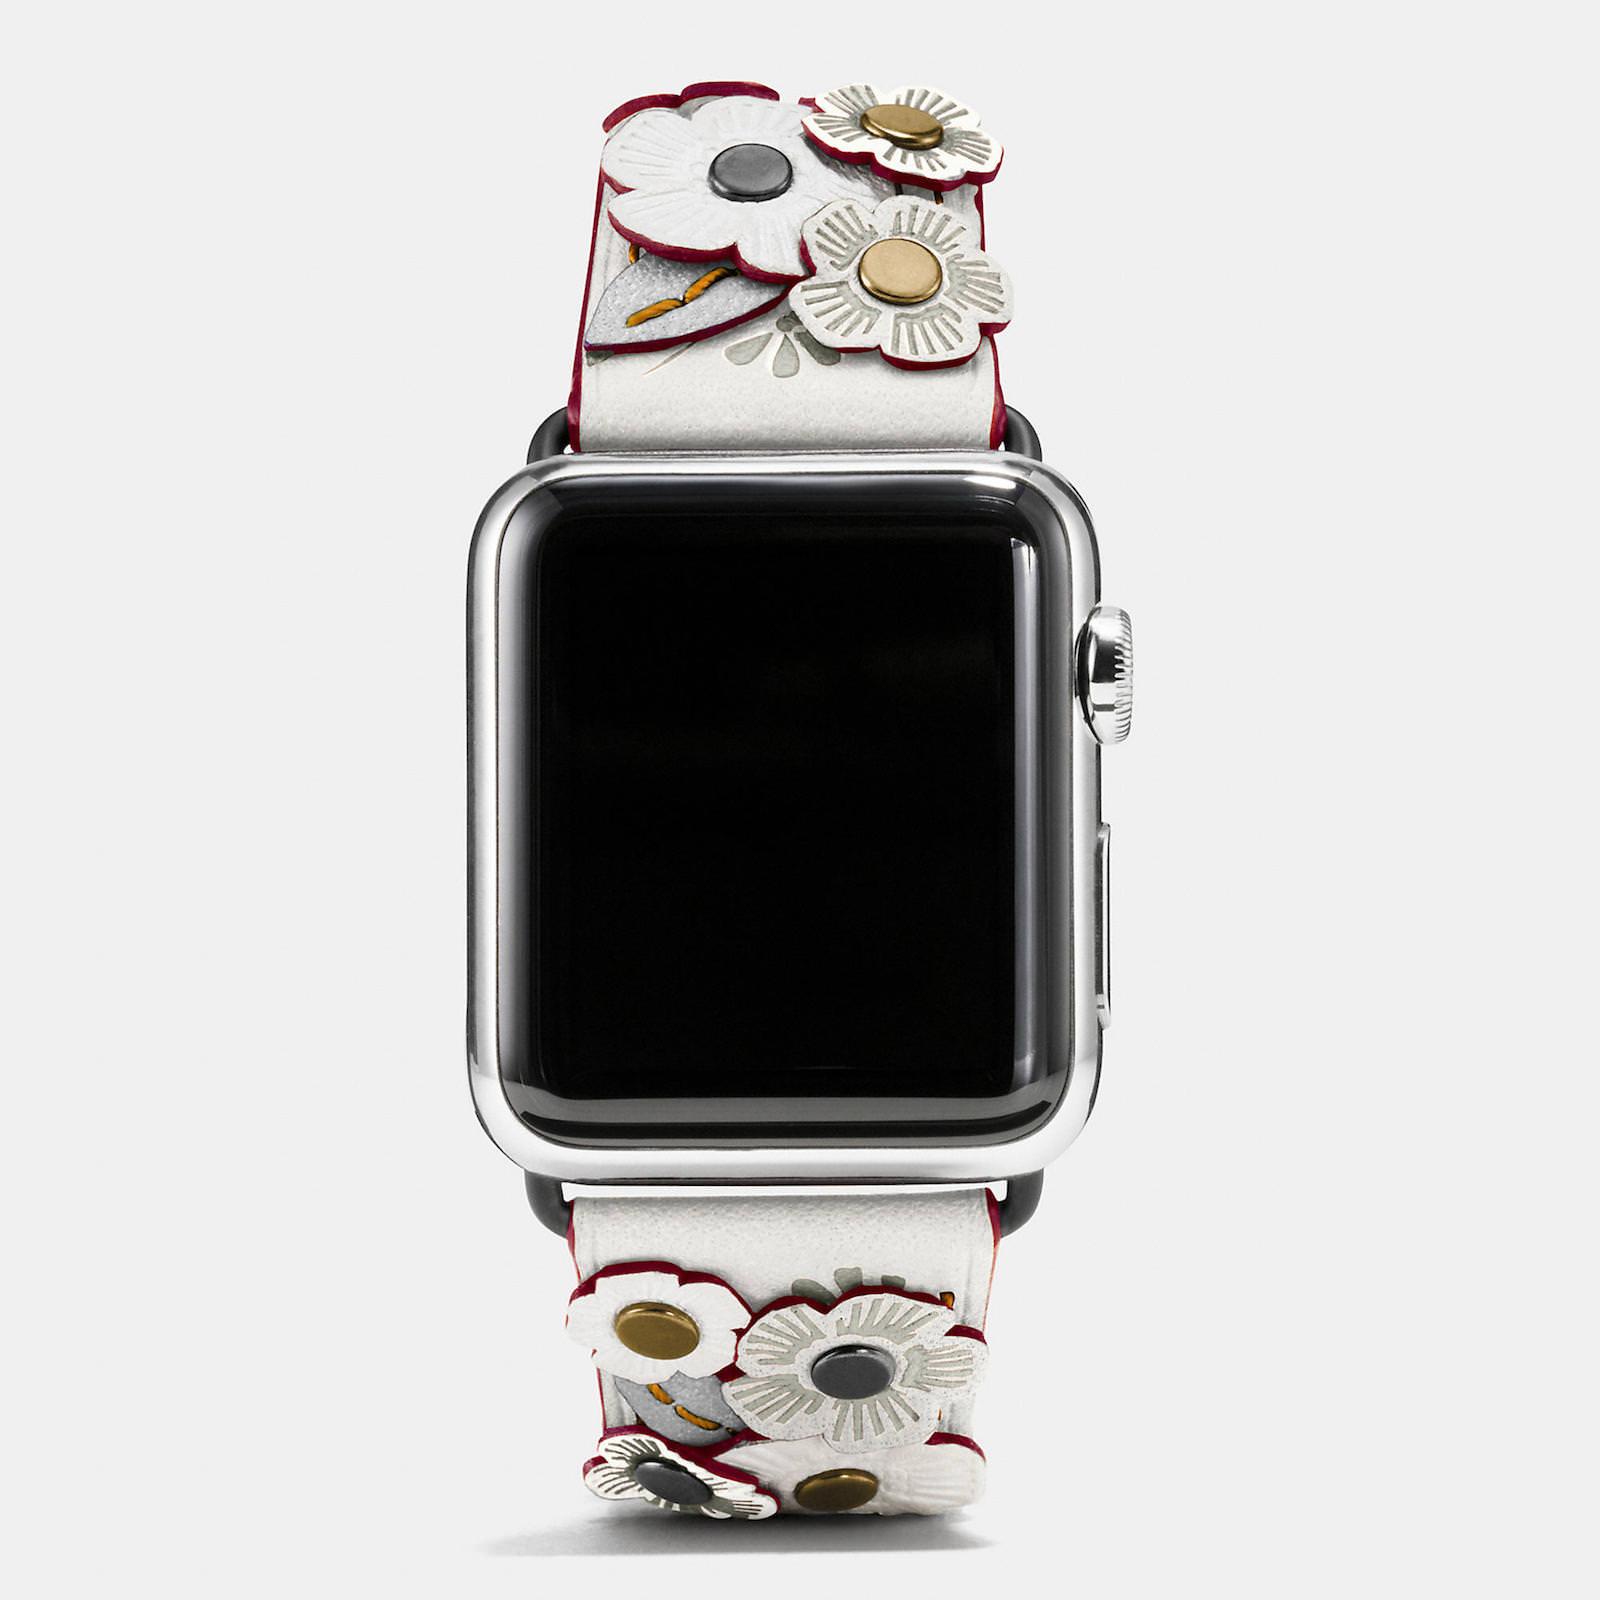 Apple-Watch-Coach-Band-Autumn-Season-12.jpeg